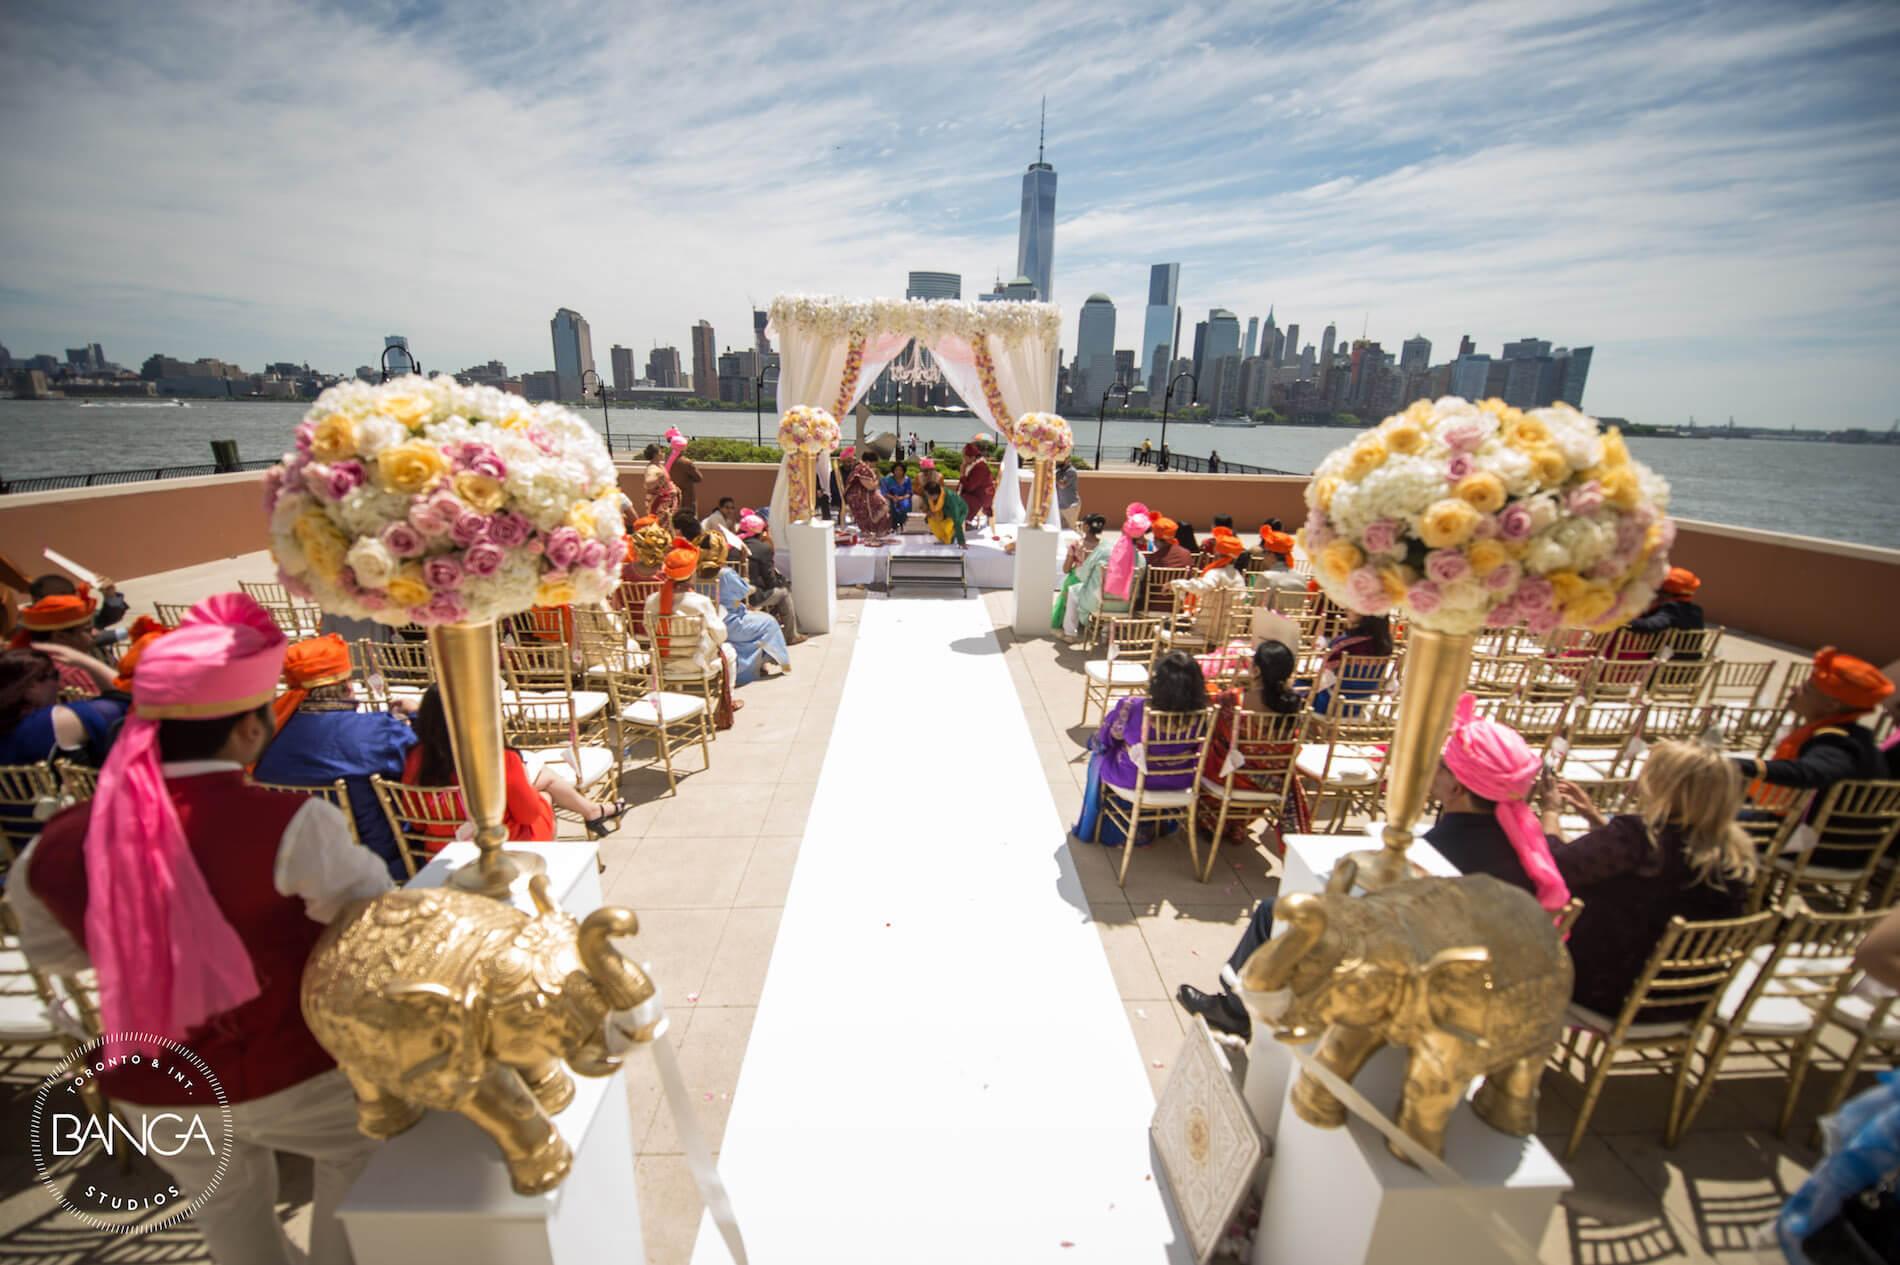 Wedding Hashtag Generator Puns.Ten Hashtag Ideas To Help You Create Your Own Wedding